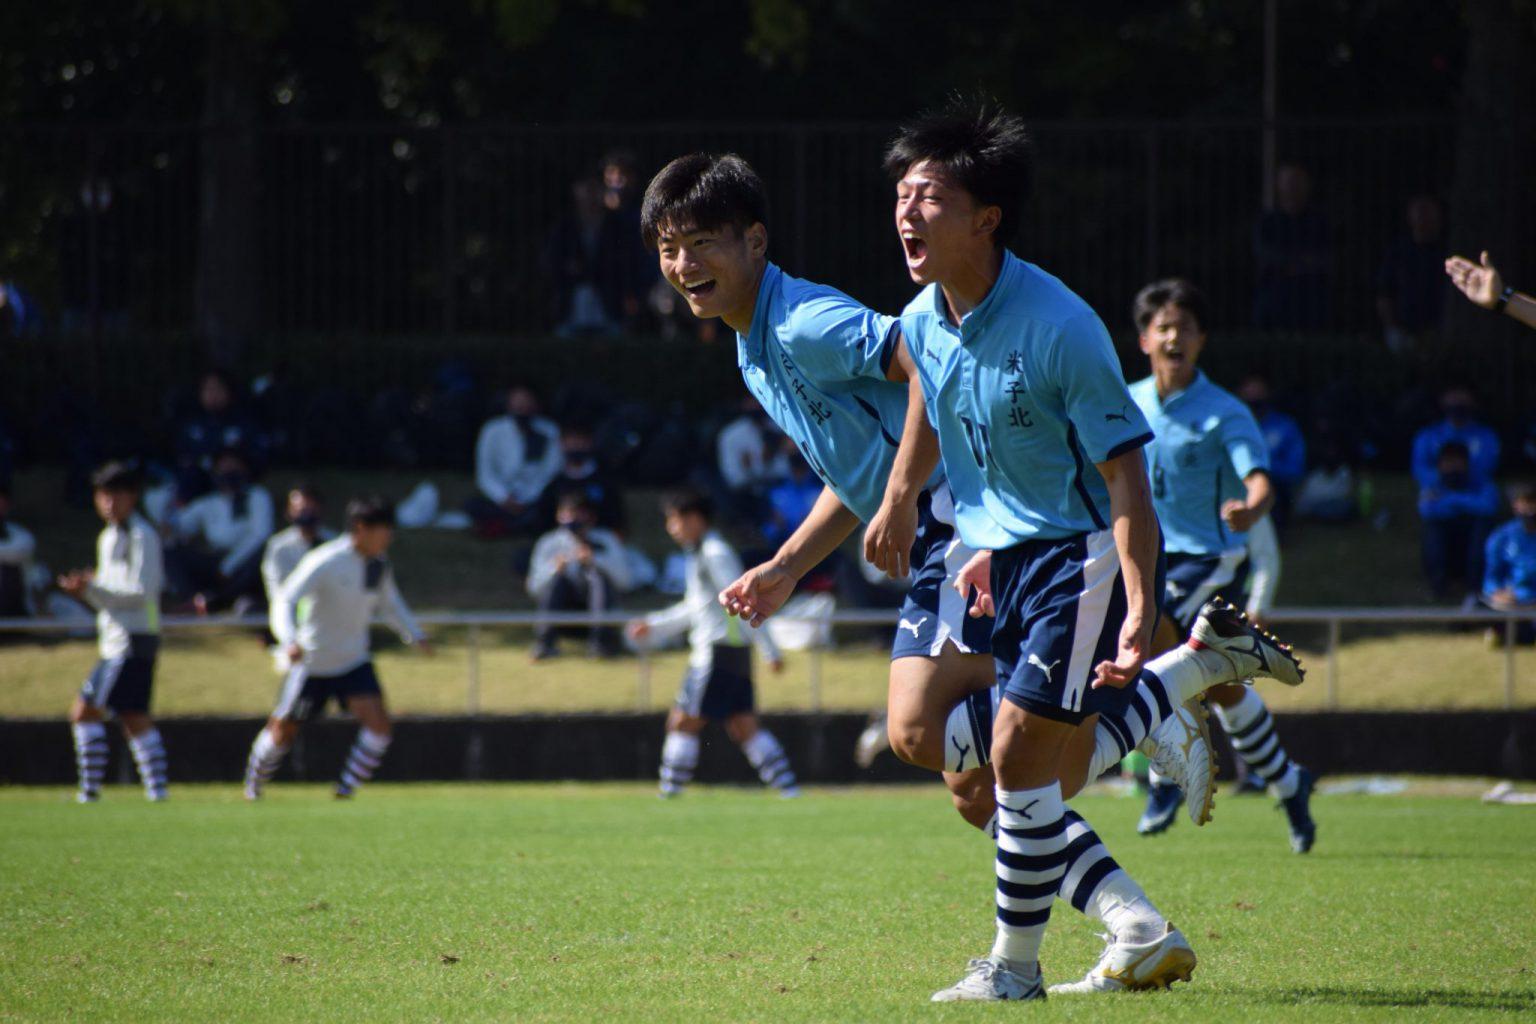 サッカー:10/25・鳥取城北戦 試合結果